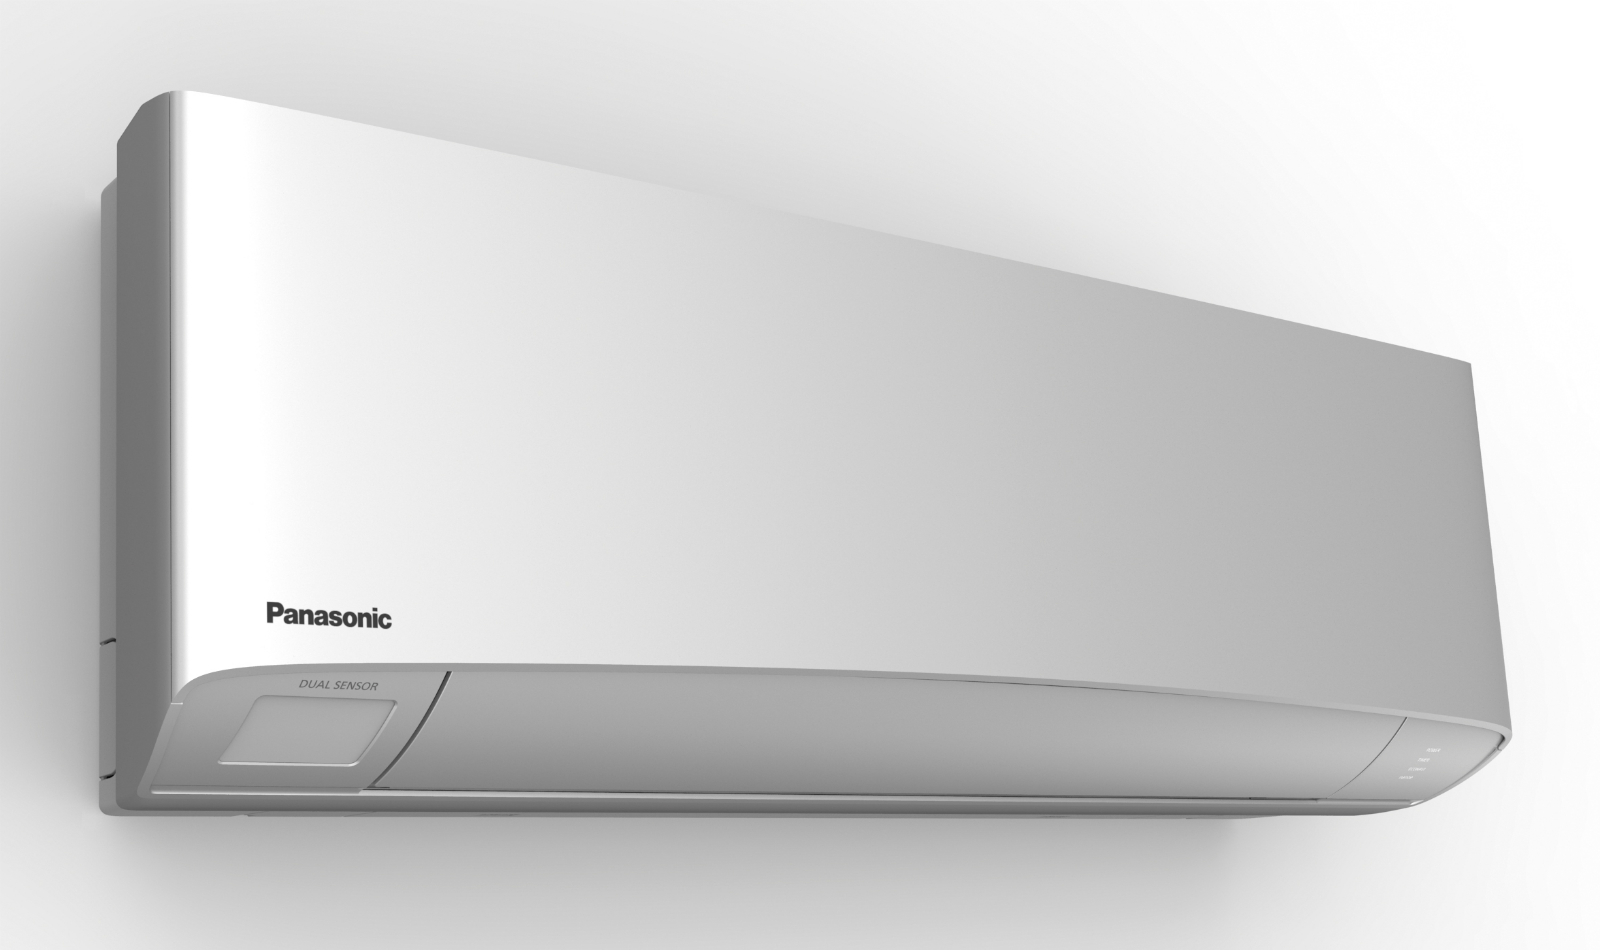 Купить Panasonic CS-XZ25TKE / CU-XZ25TKE в Нижнем Новгороде